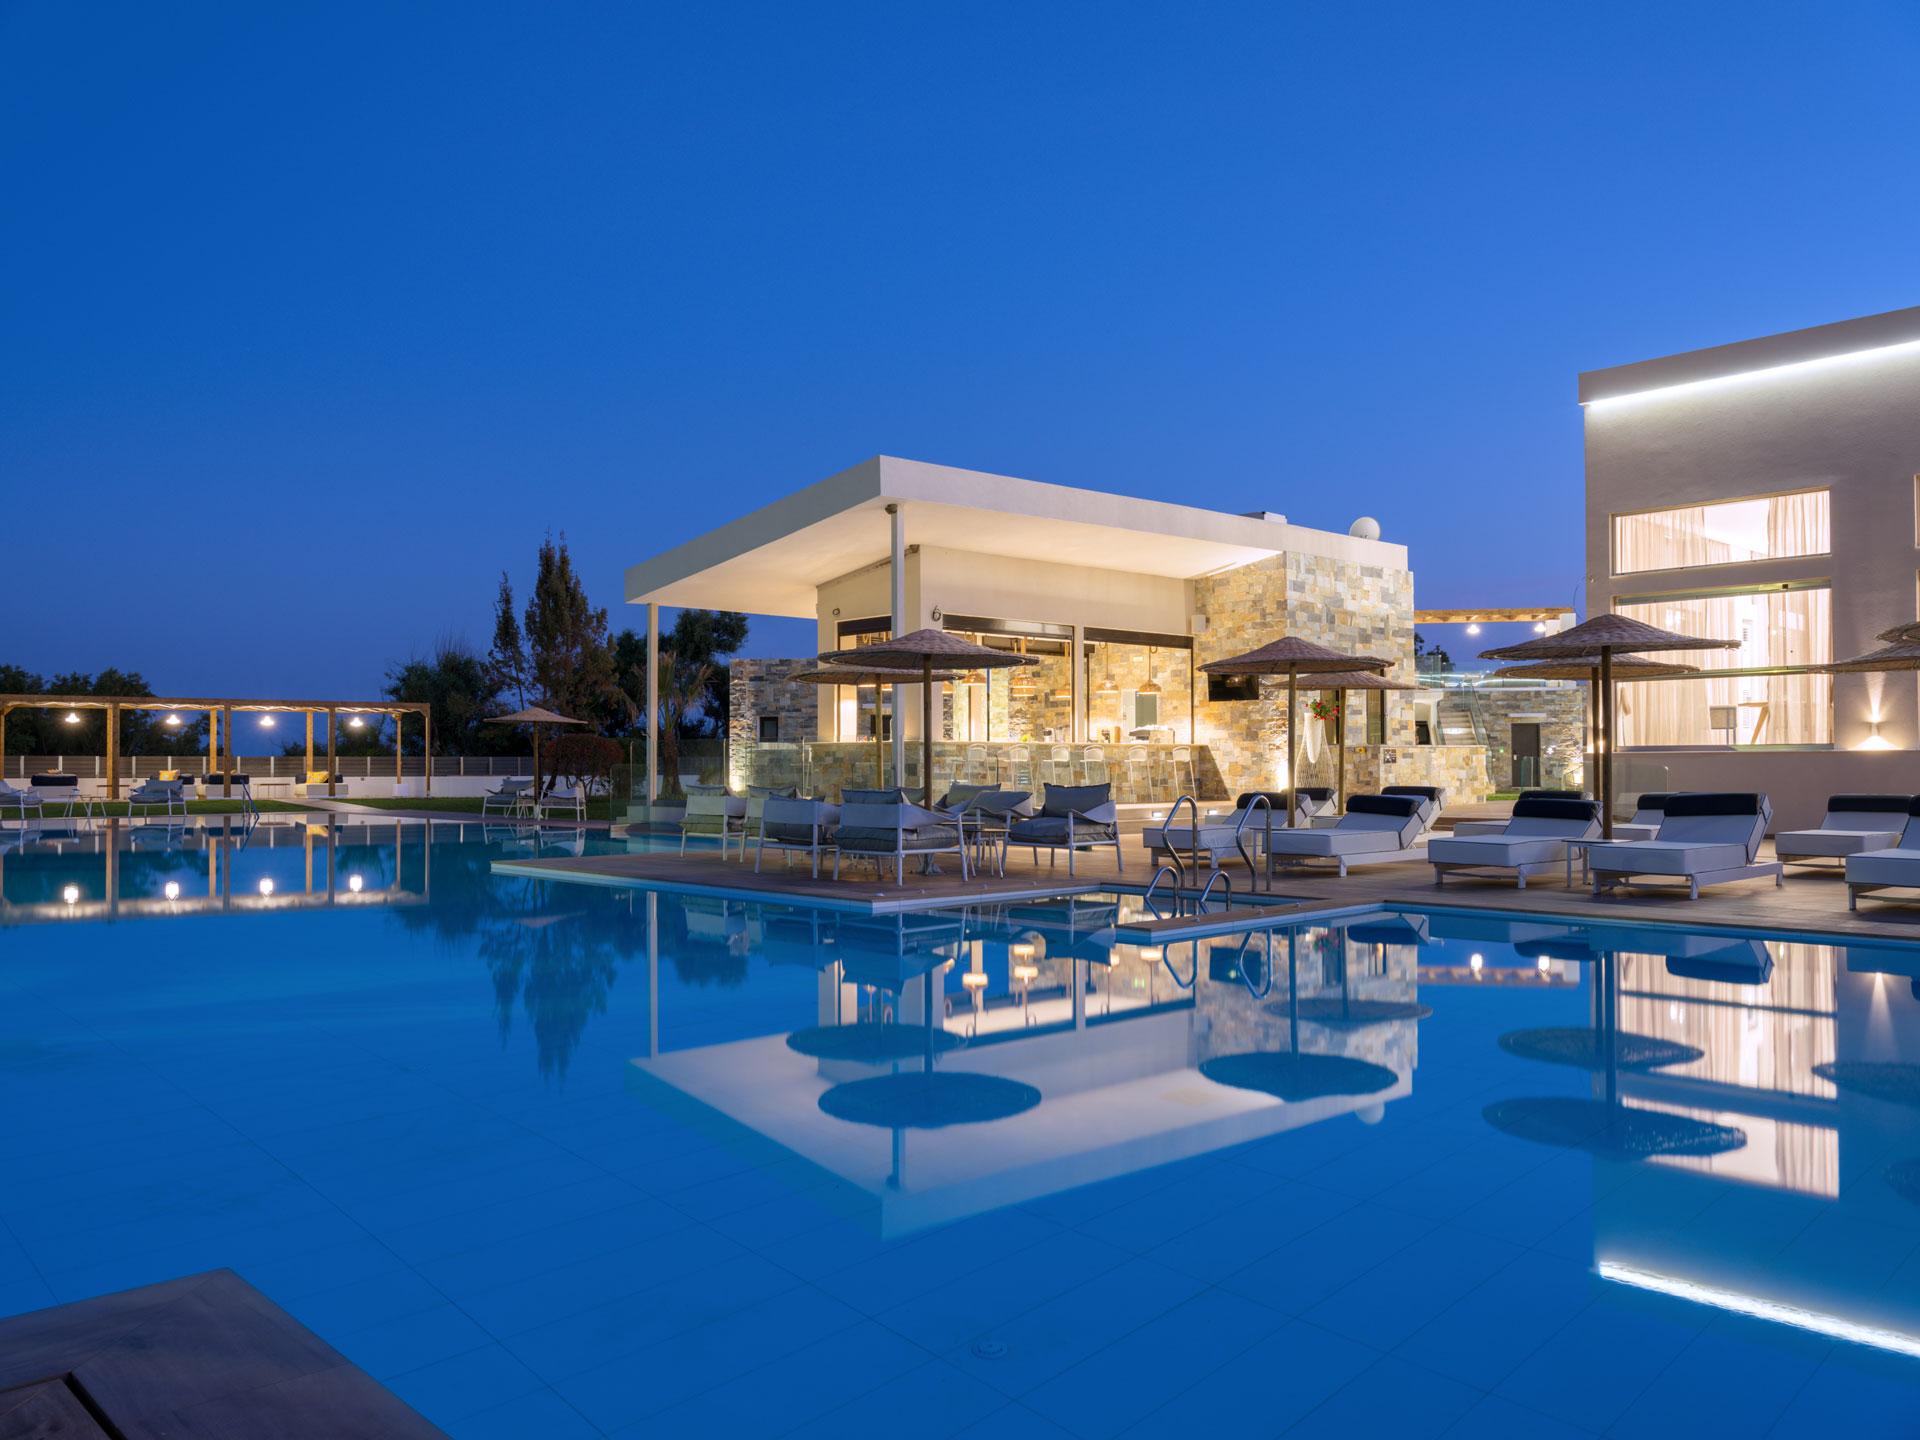 4* Golden Sun Resort - Ζάκυνθος Καλαμάκι ✦ -20% ✦ 4 Ημέρες (3 Διανυκτερεύσεις) ✦ 2 άτομα ✦ All Inclusive ✦ 01/08/2021 έως 31/08/2021 ✦ Κοντά στη παραλία!